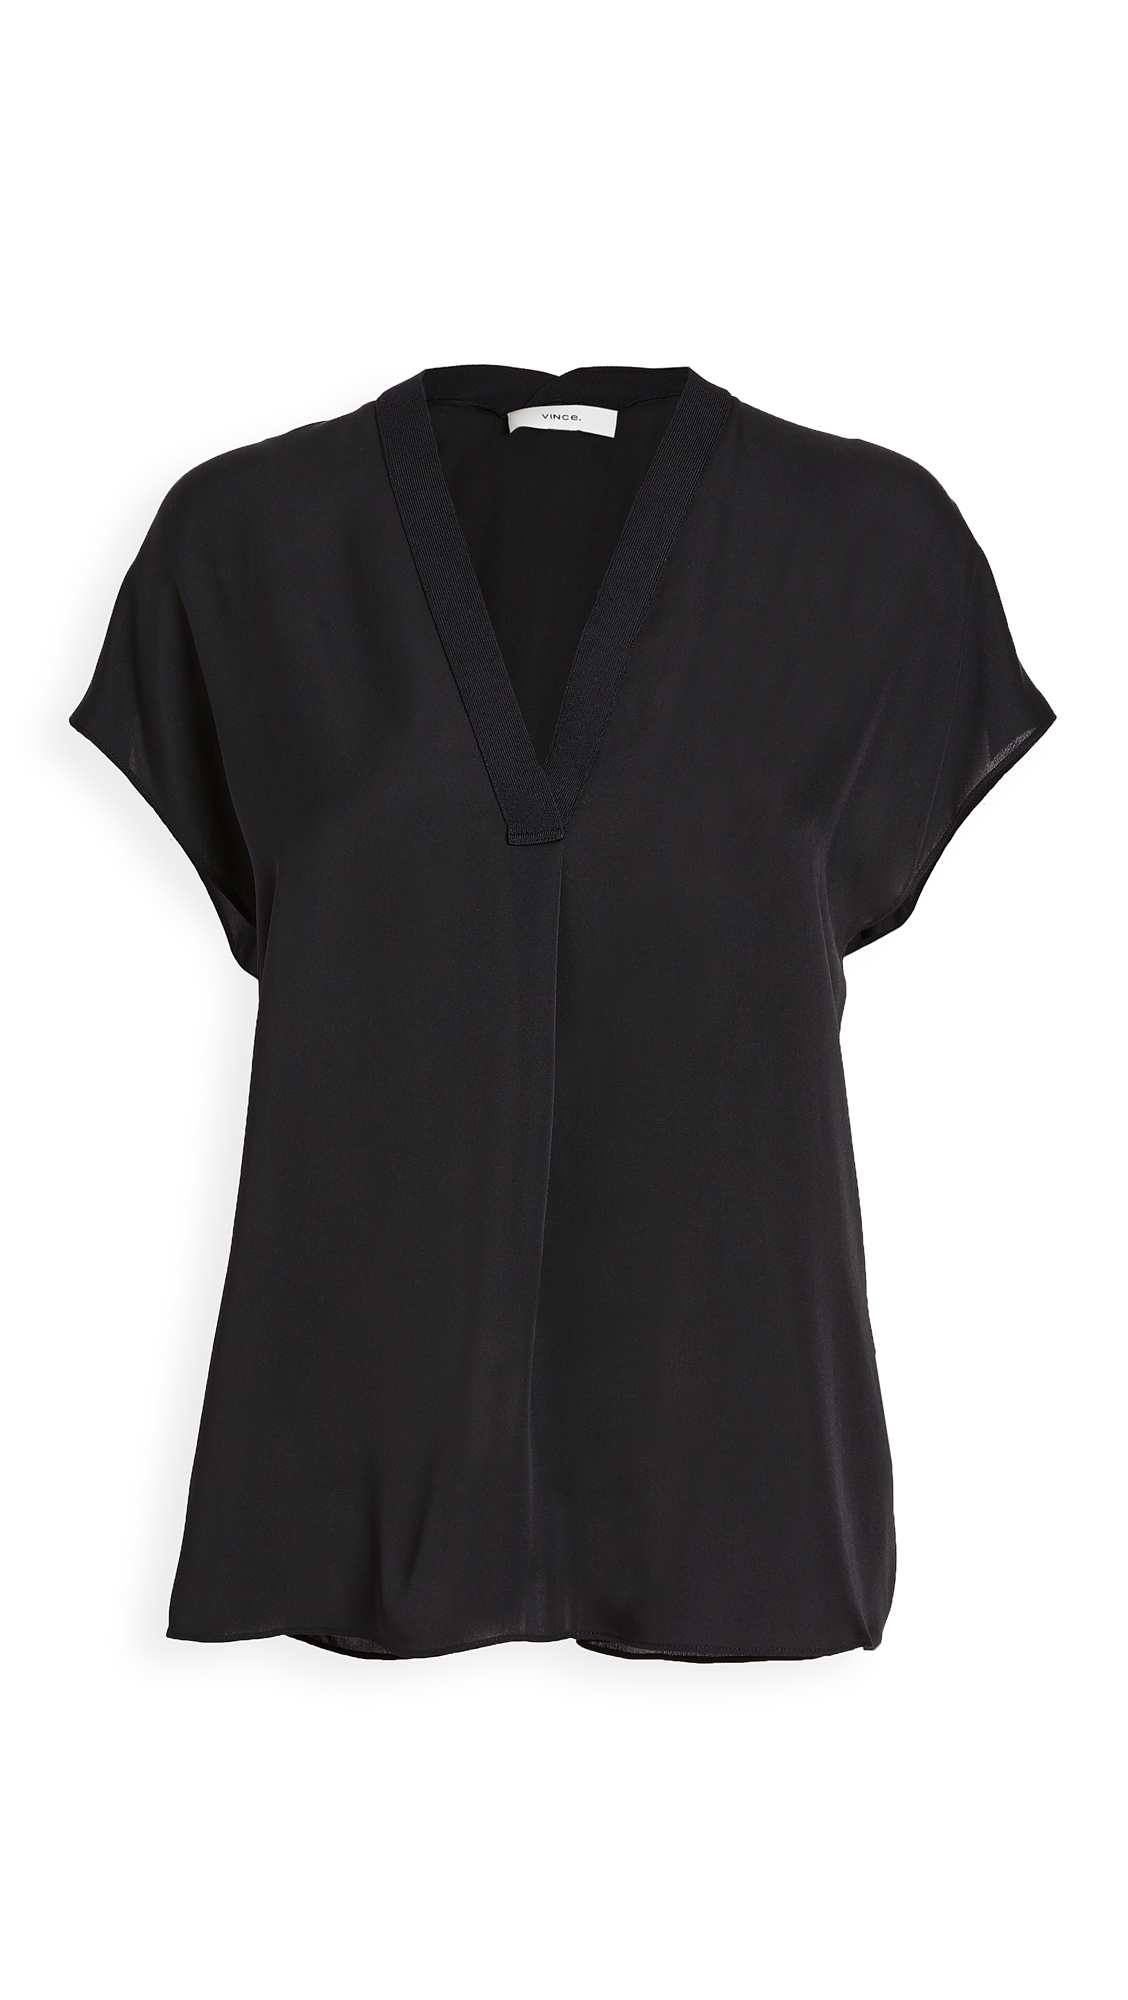 Vince Short Sleeve Rib Trim Double V Neck Blouse - 50% Off Sale